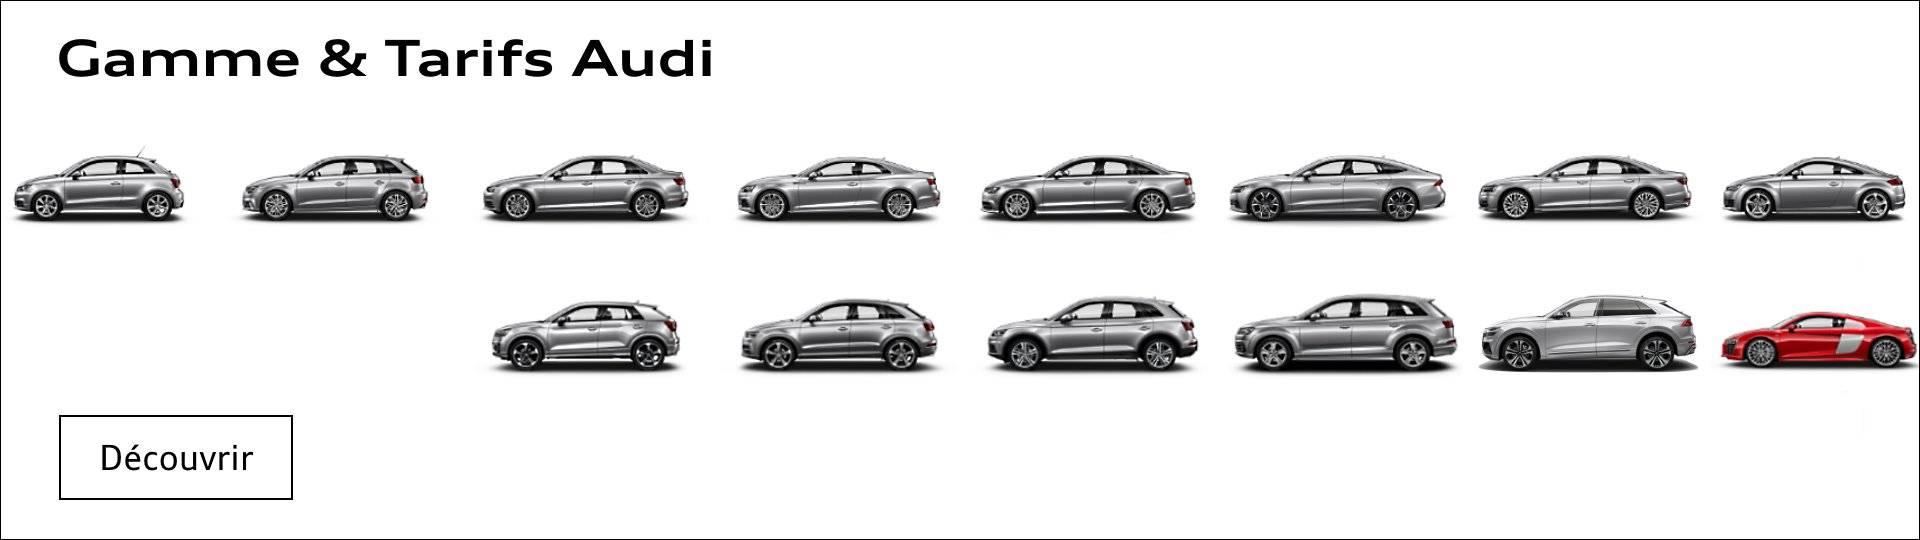 Tarifs Audi A1 A3 A4 A5 A6 A7 A8 Q2 Q3 Q5 Q7 Q8 TT